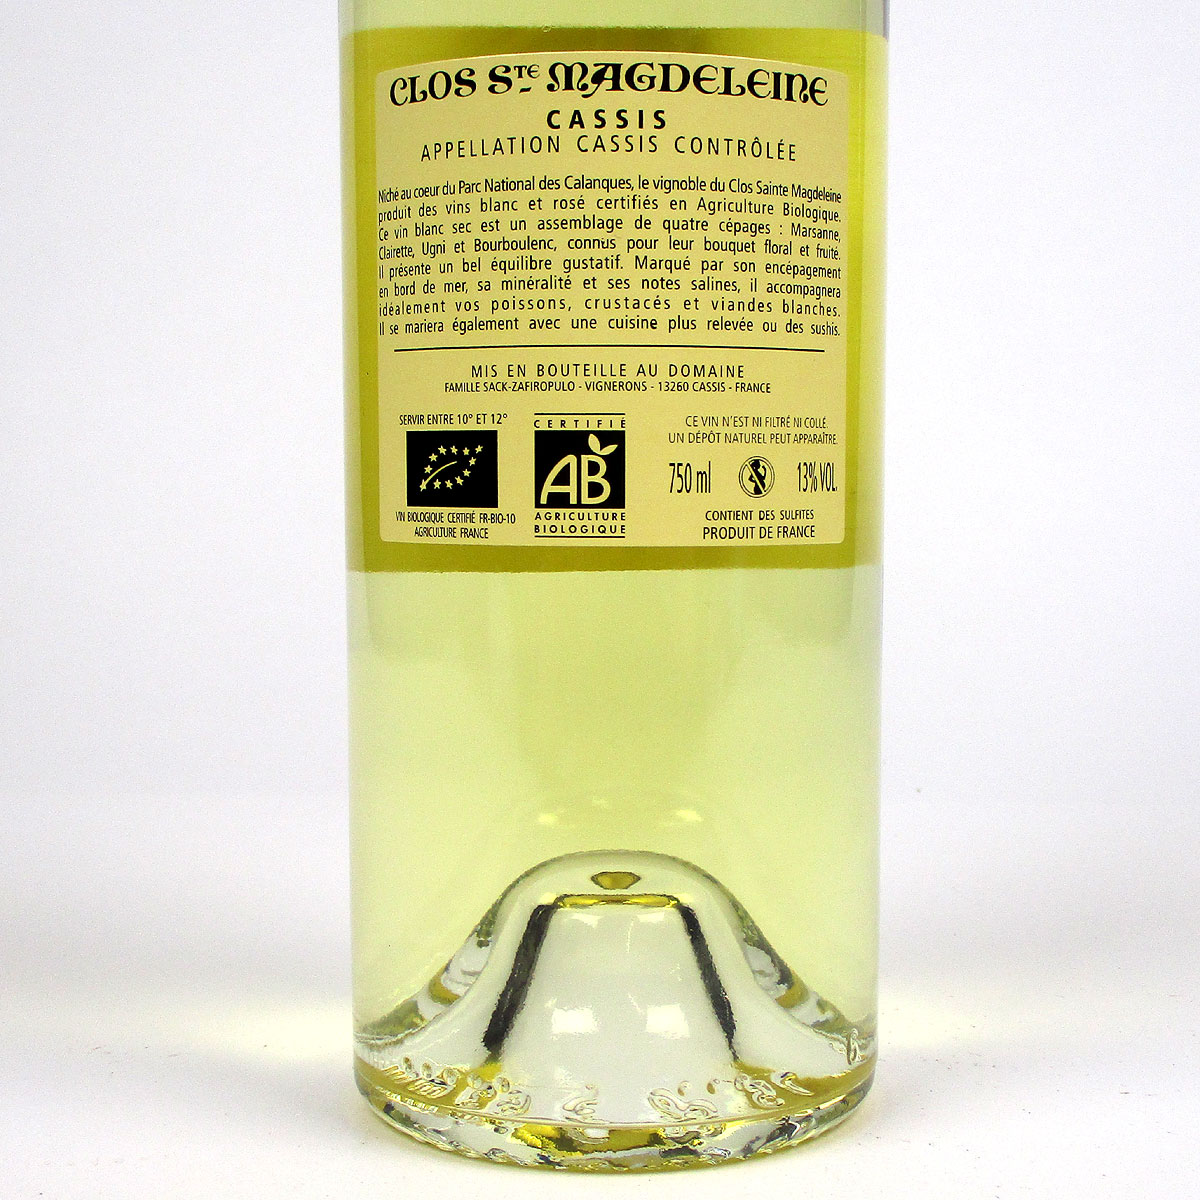 Cassis: Clos Sainte Magdeleine Blanc 2020 - Rear Label